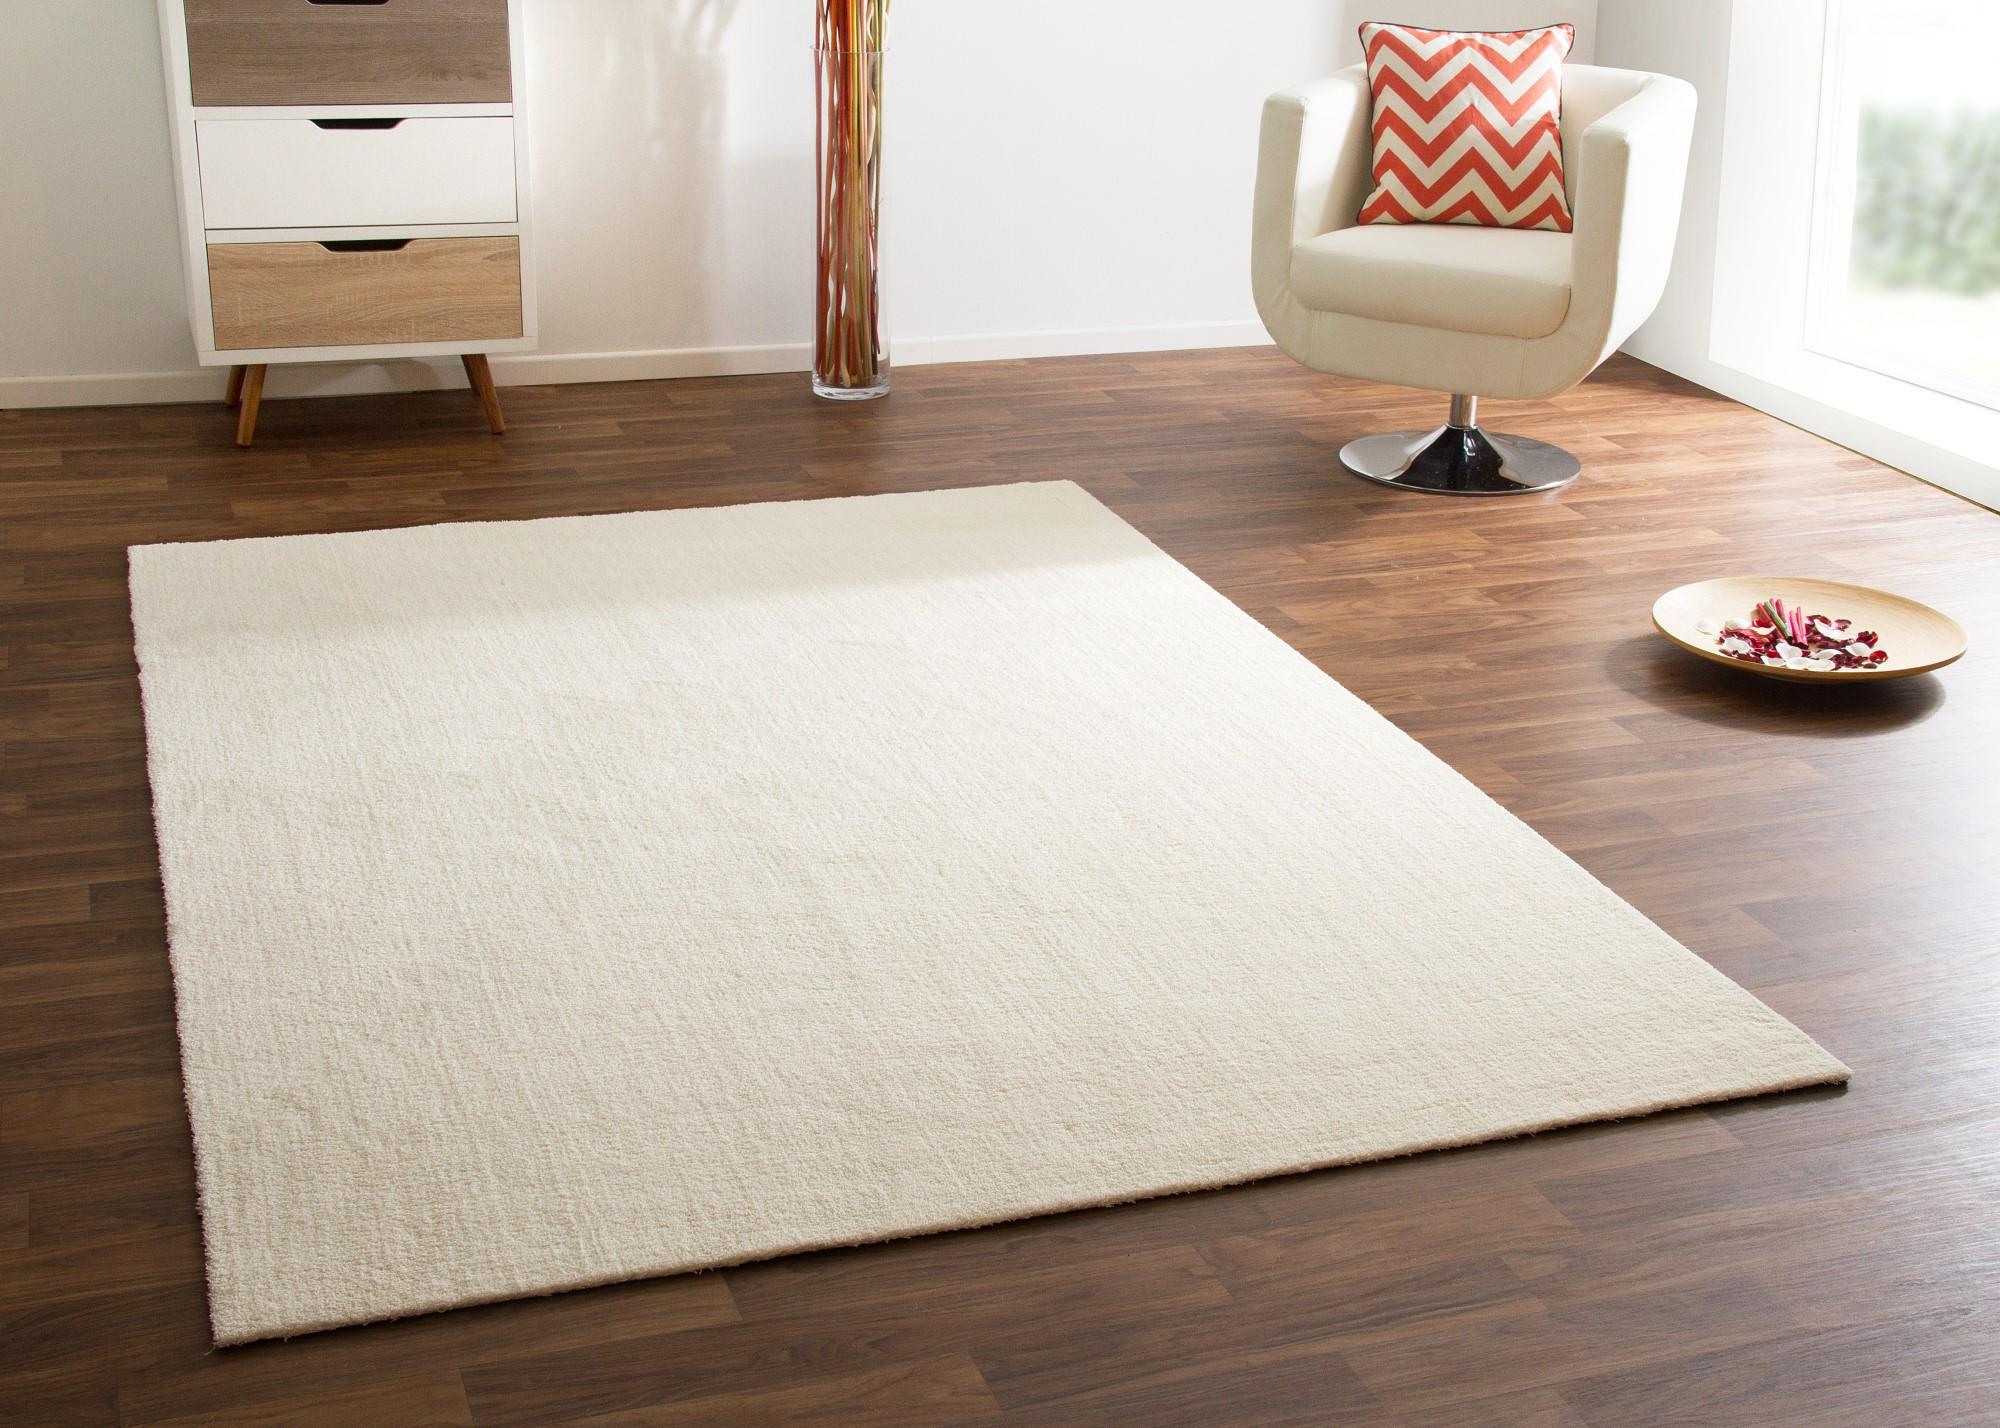 Modern Rug Atlantis Super Soft Soft And Flexible Fleece